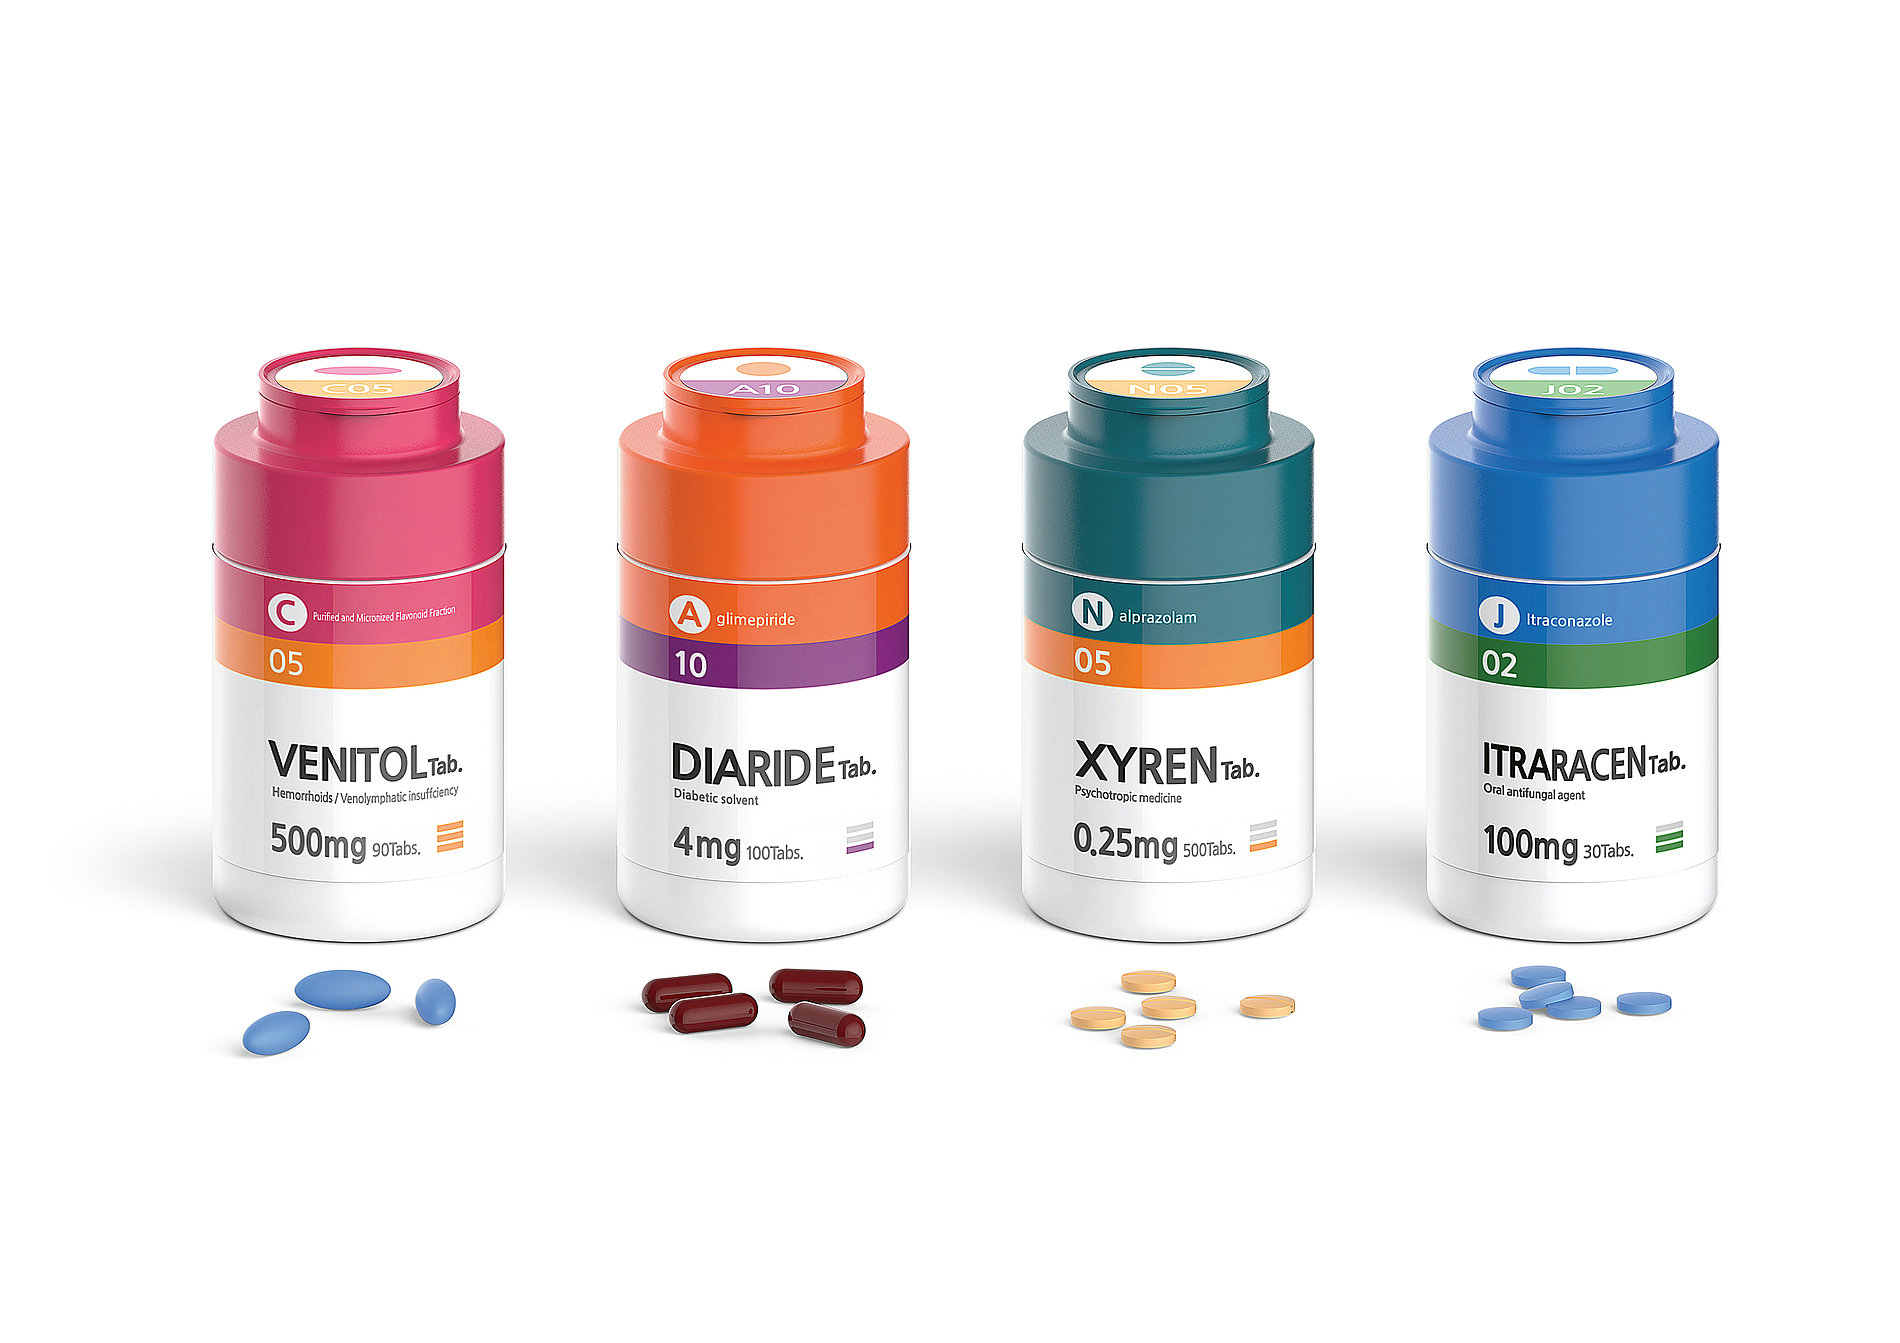 Easy Check Medication | Red Dot Design Award